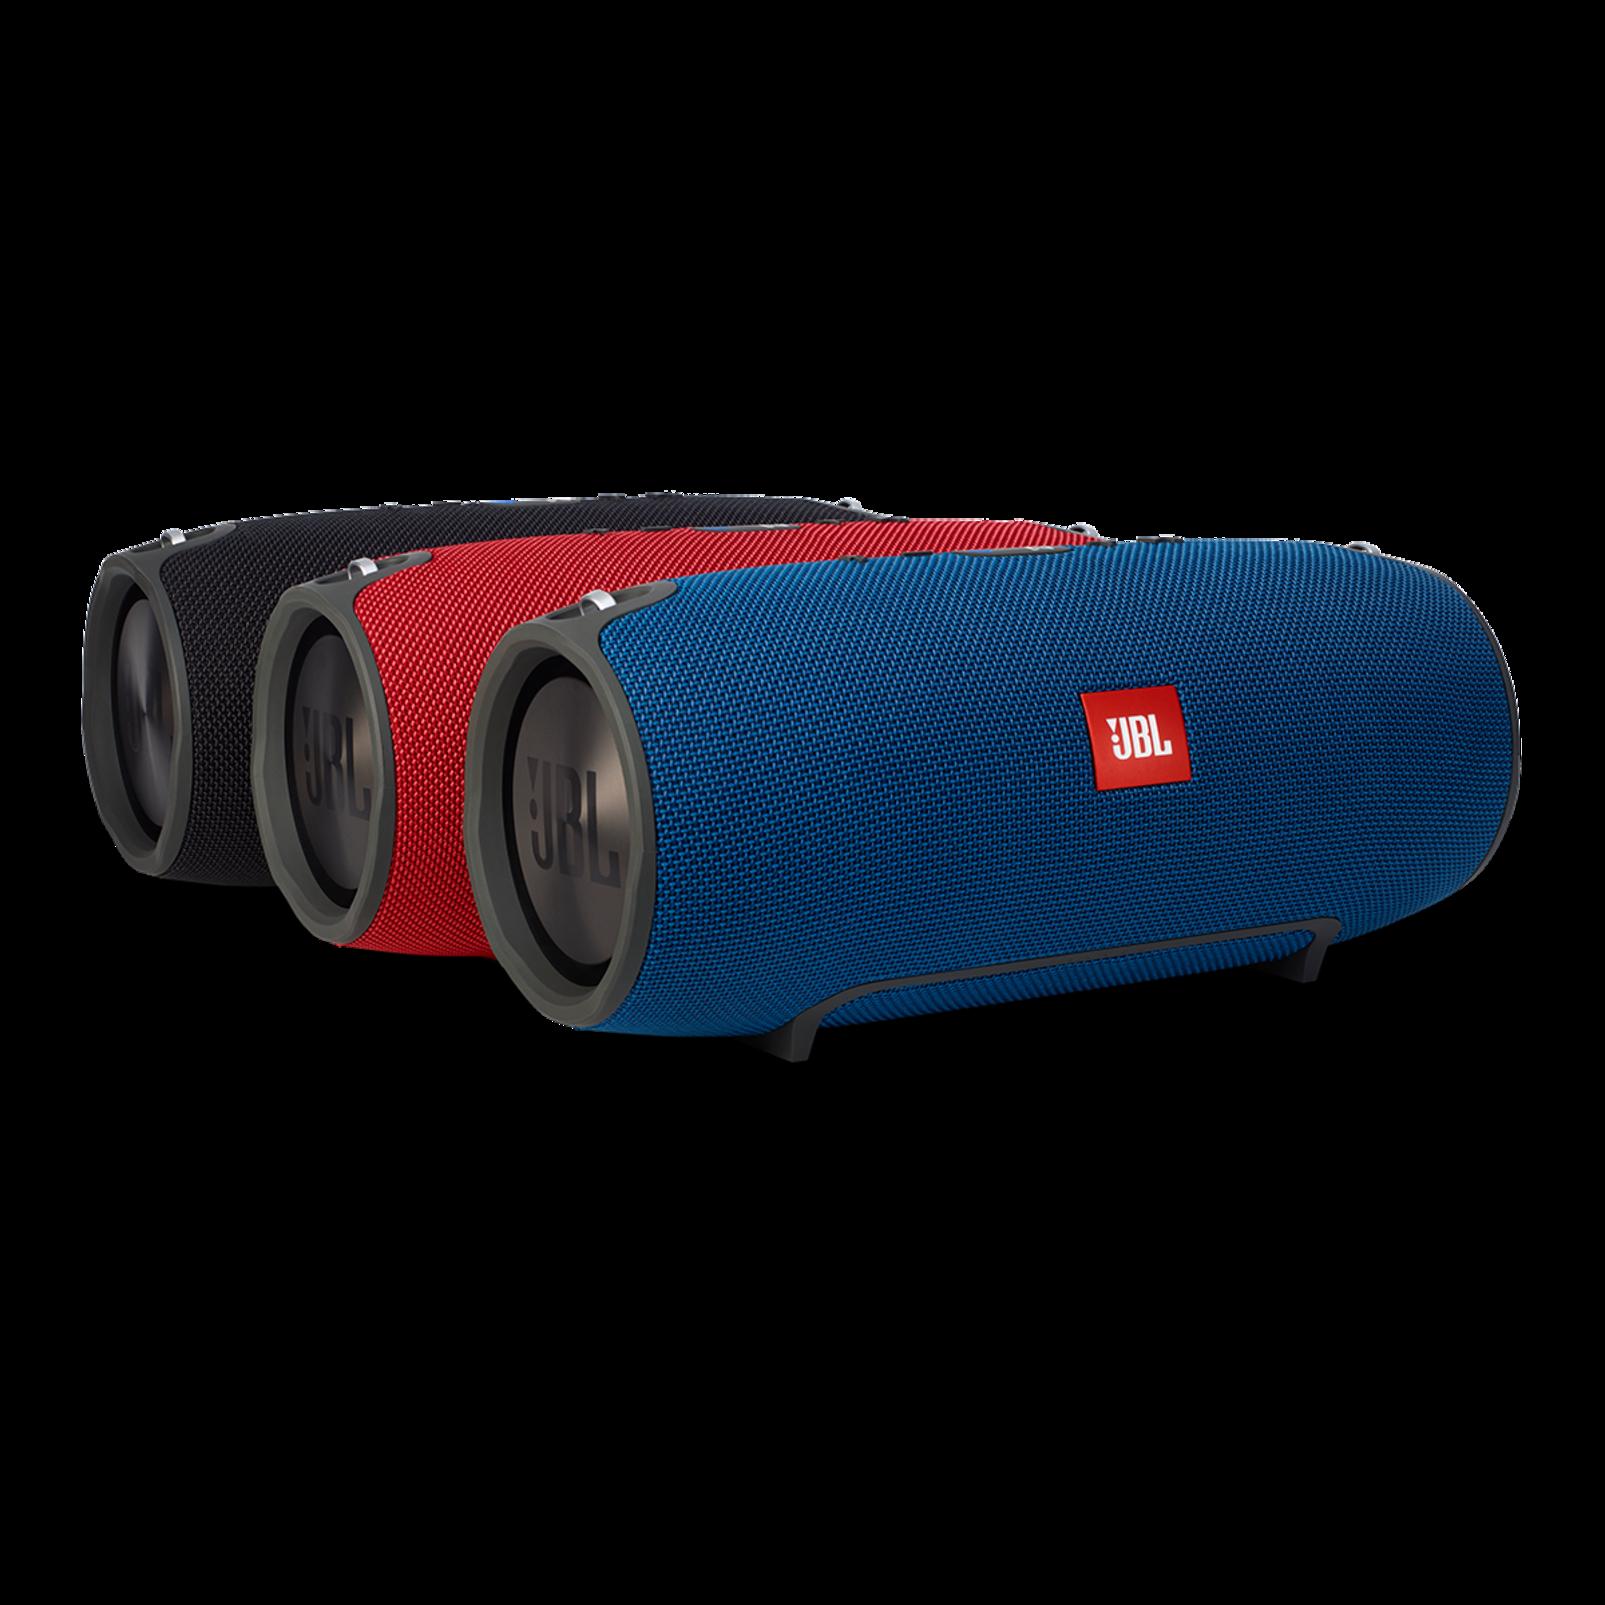 JBL Xtreme - Blue - Splashproof portable speaker with ultra-powerful performance - Detailshot 5